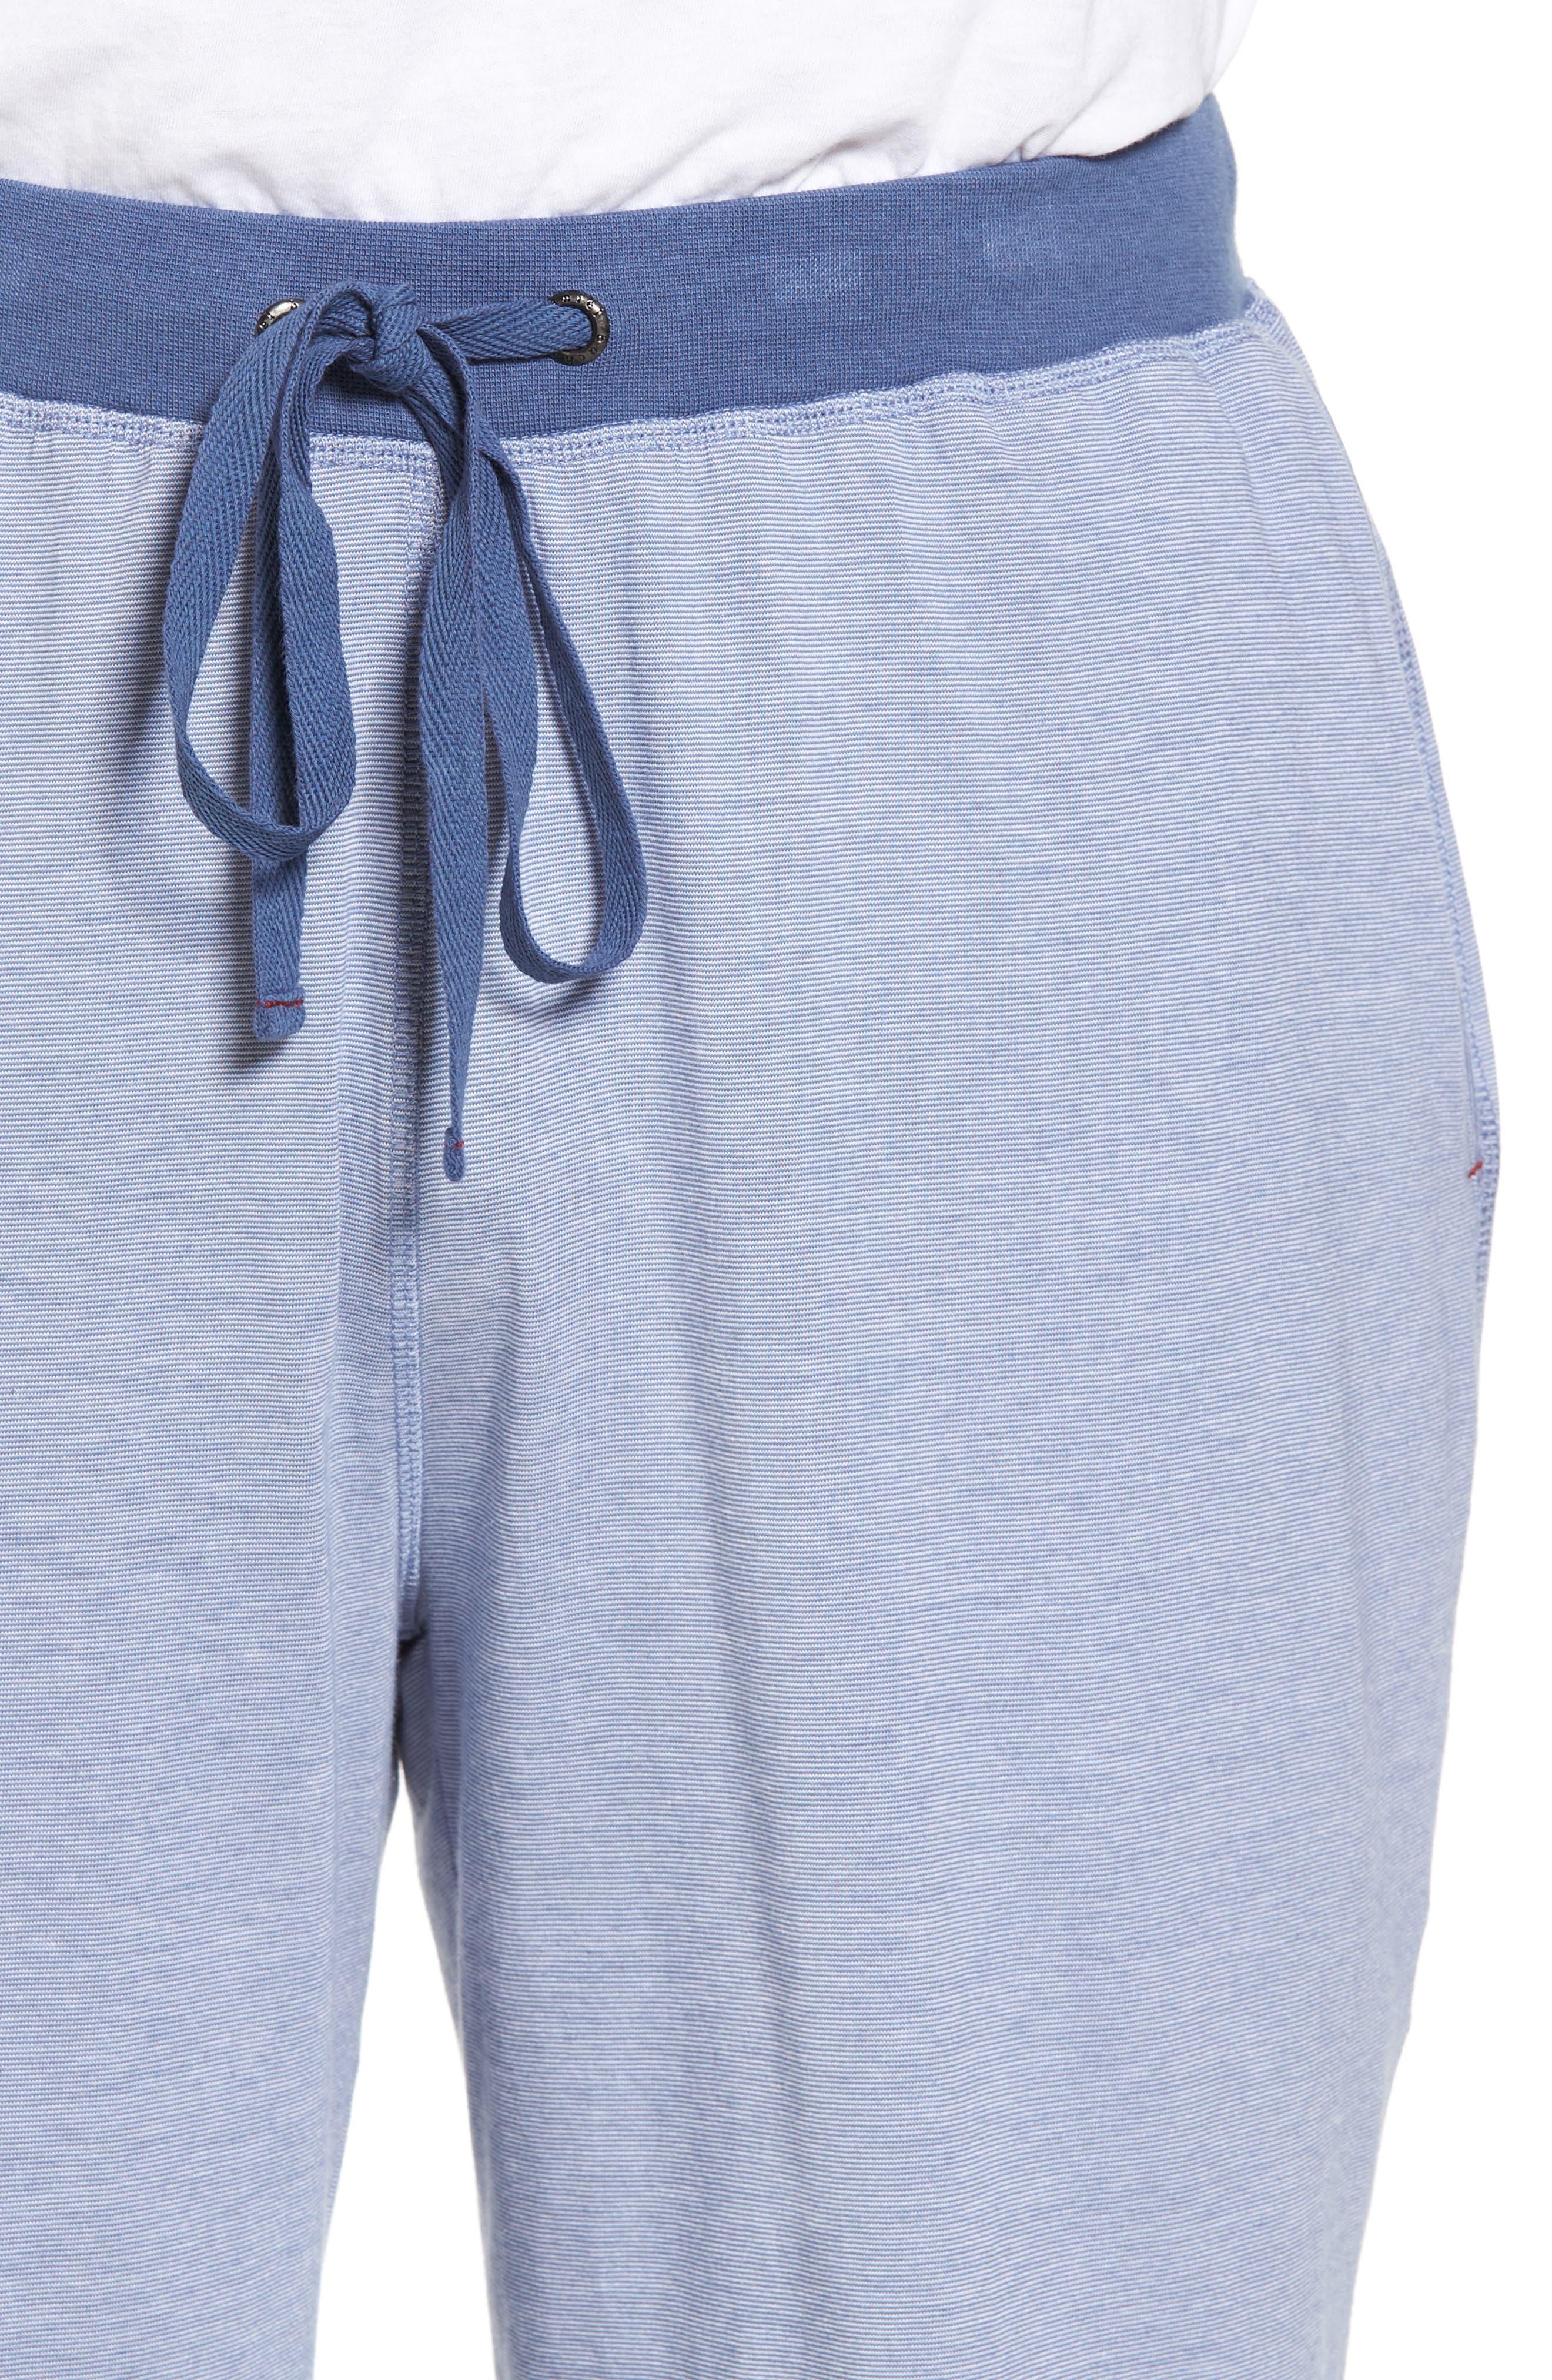 Pima Cotton & Modal Lounge Shorts,                             Alternate thumbnail 4, color,                             Blue/ Ivory